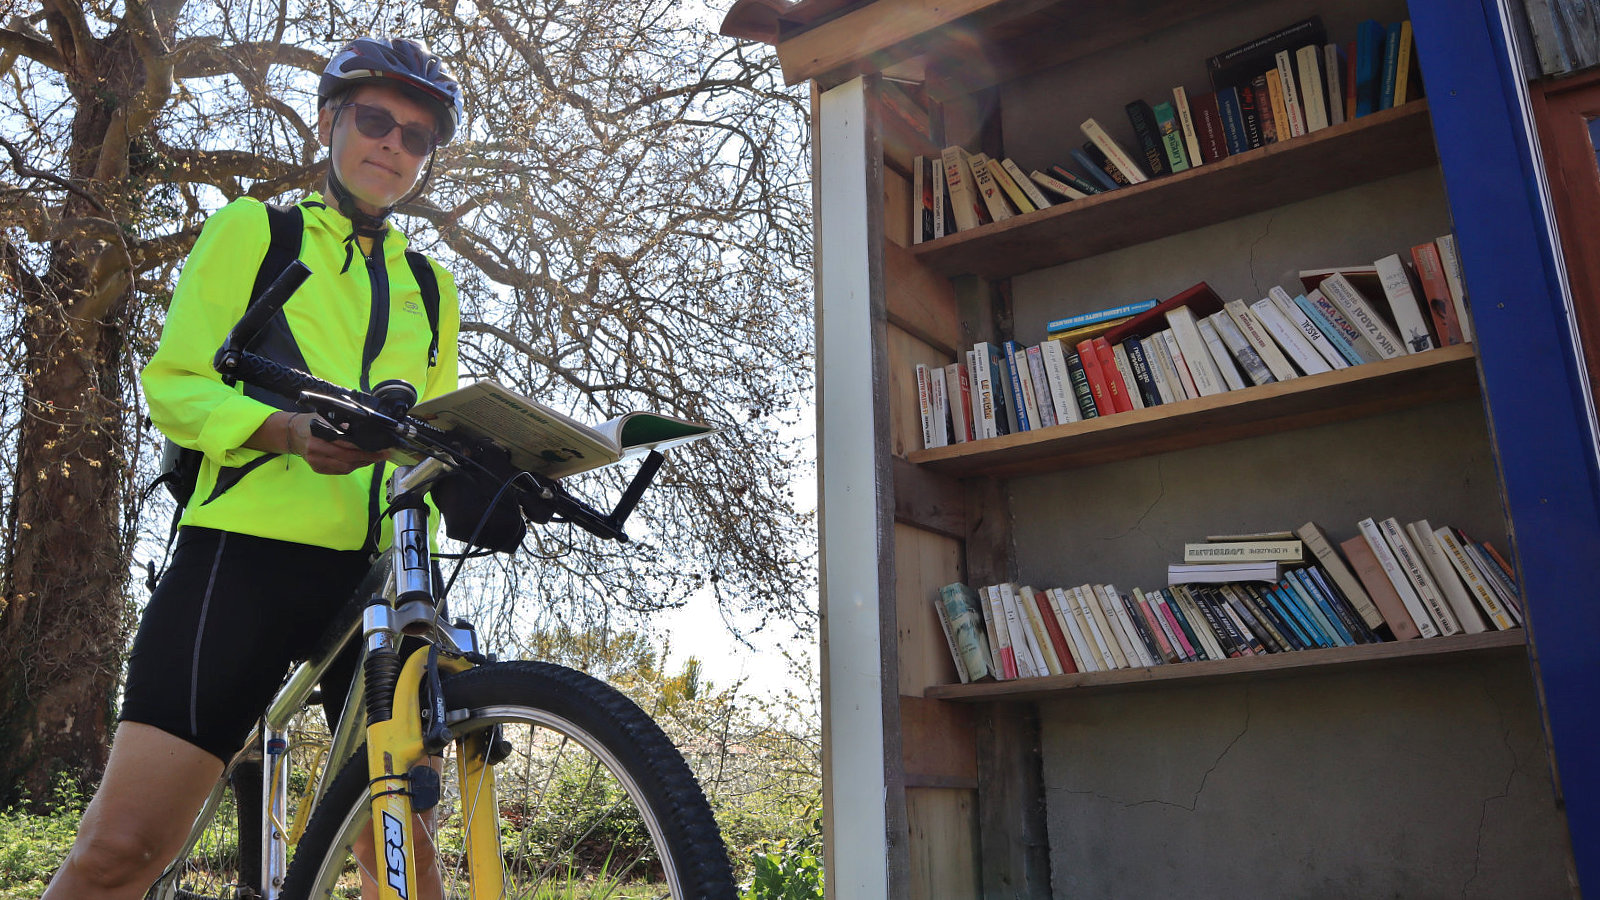 Una piccola biblioteca lungo la ciclabile